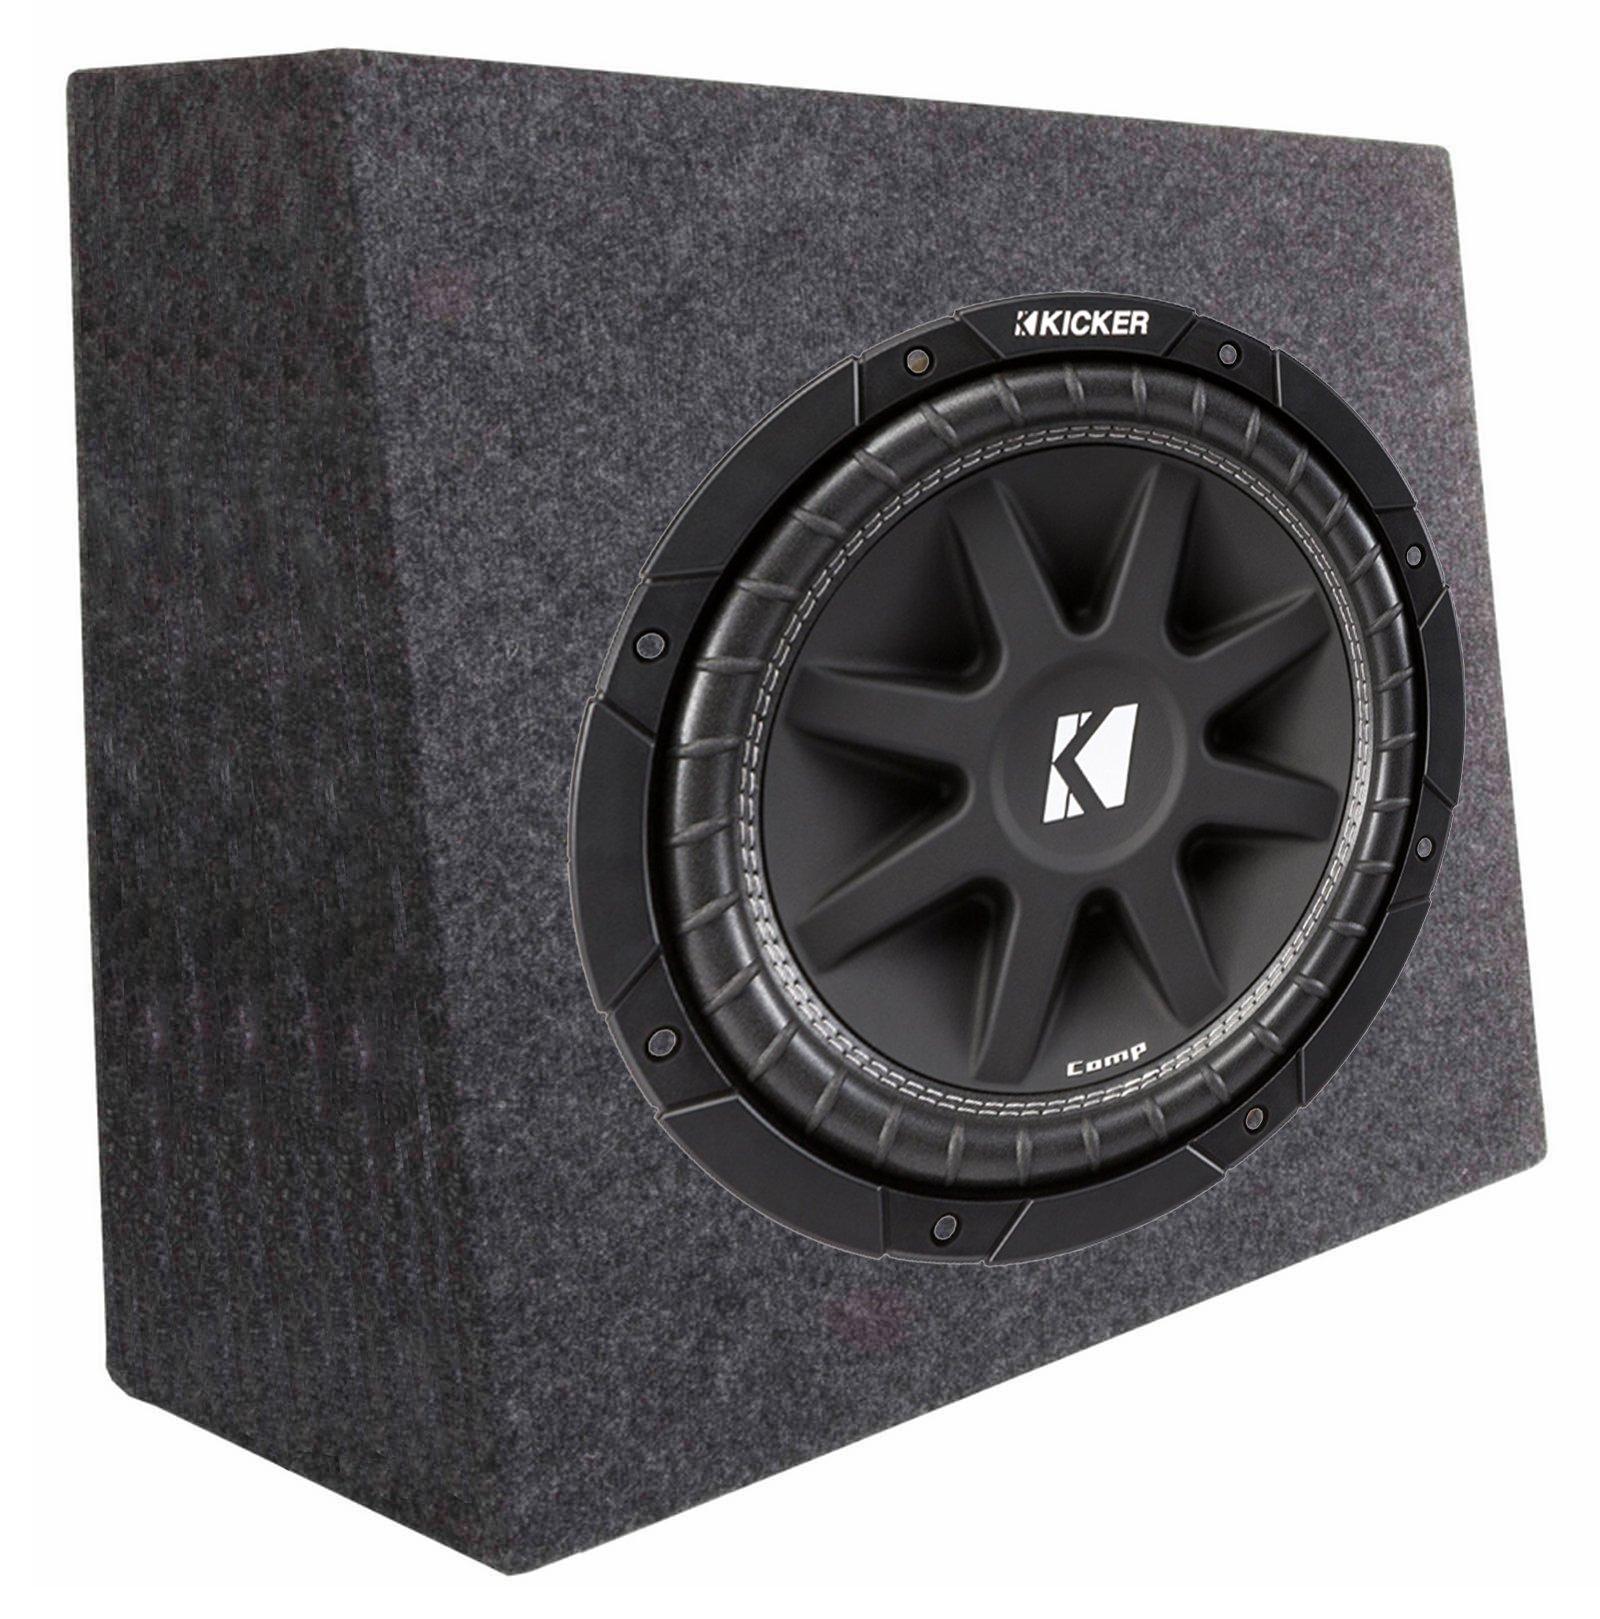 Kicker 43C124 12'' 300W 4-Ohm Car Audio Subwoofer Sub + Slim Shallow Truck Box